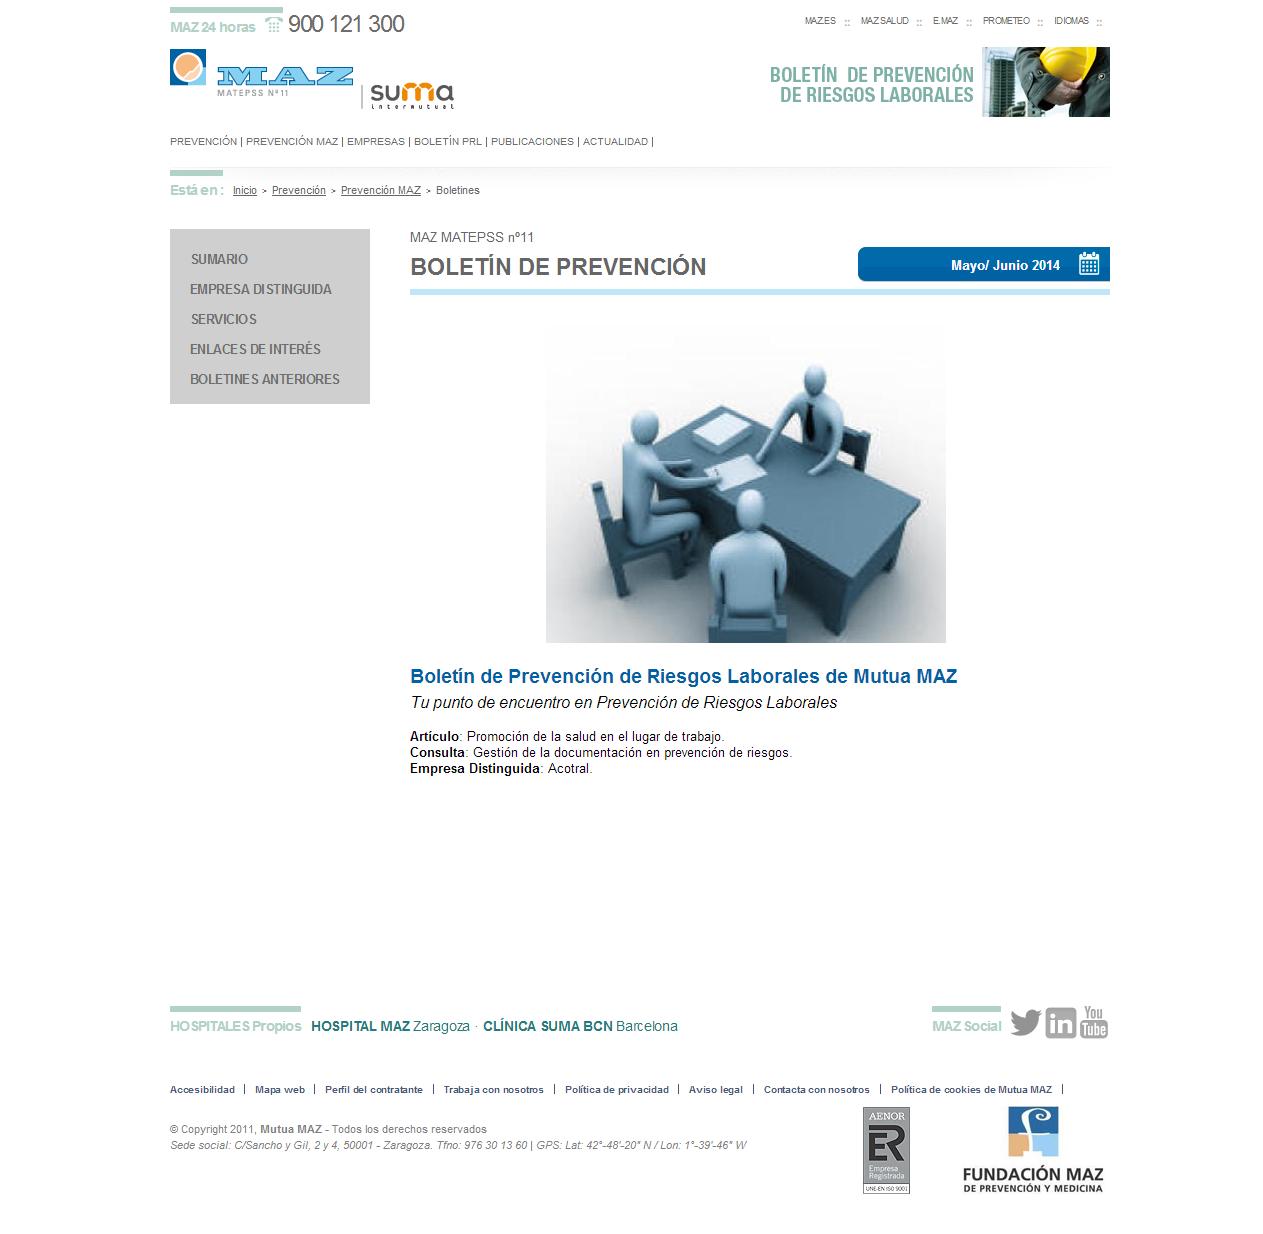 Boletín PRL - Nº 22 - Mayo 2014